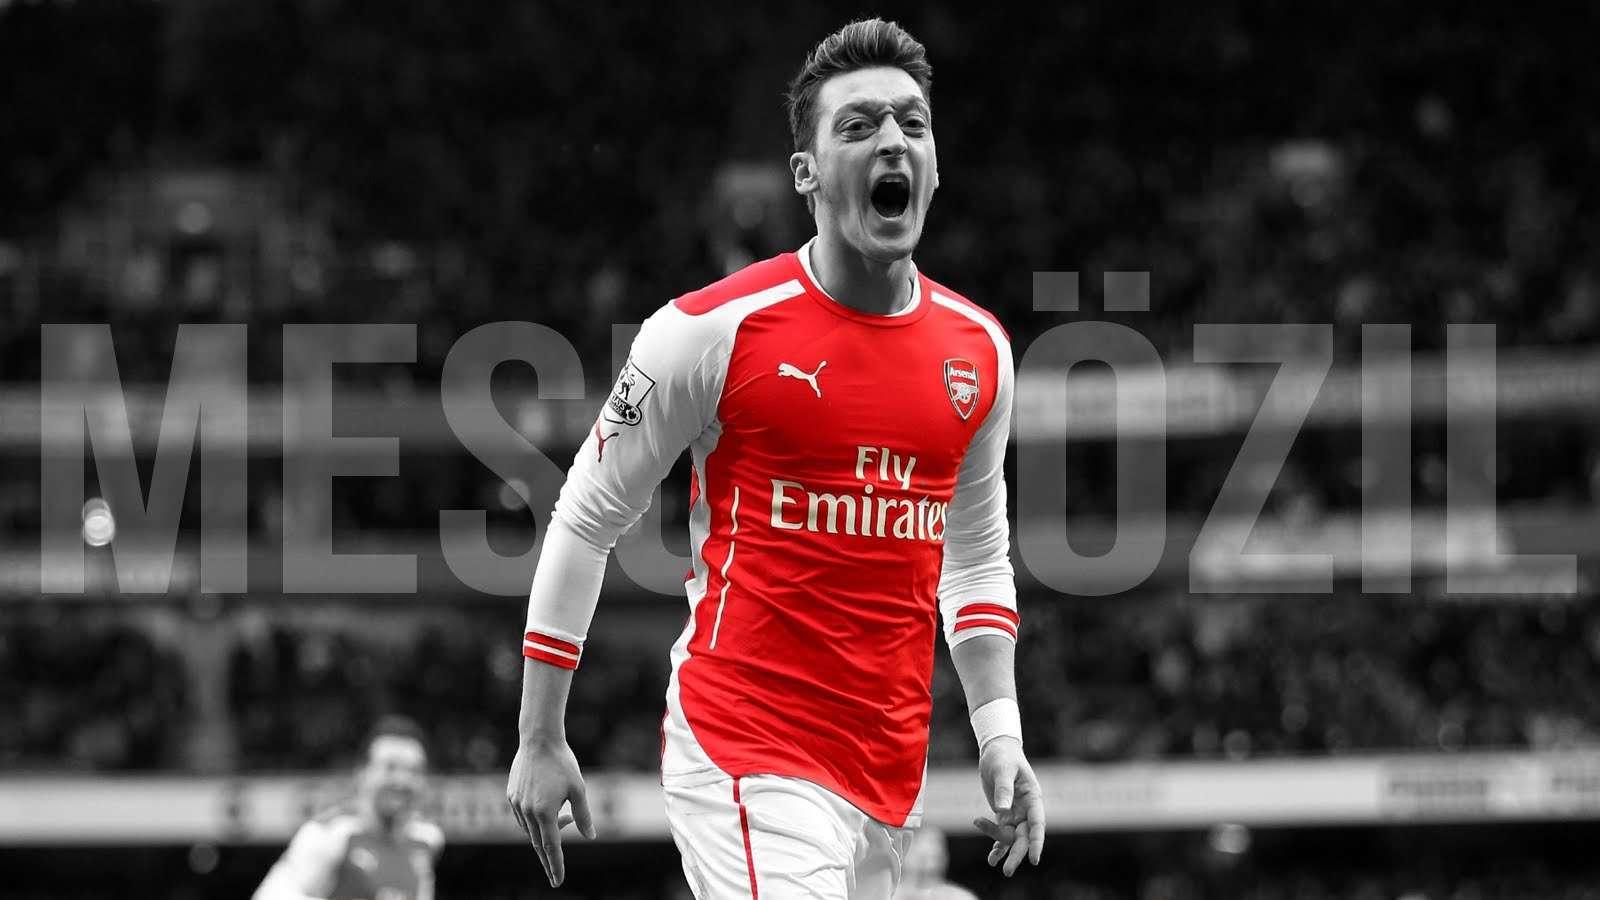 Mesut Özil Wallpaper Hd: Arsenal Wallpapers 2016